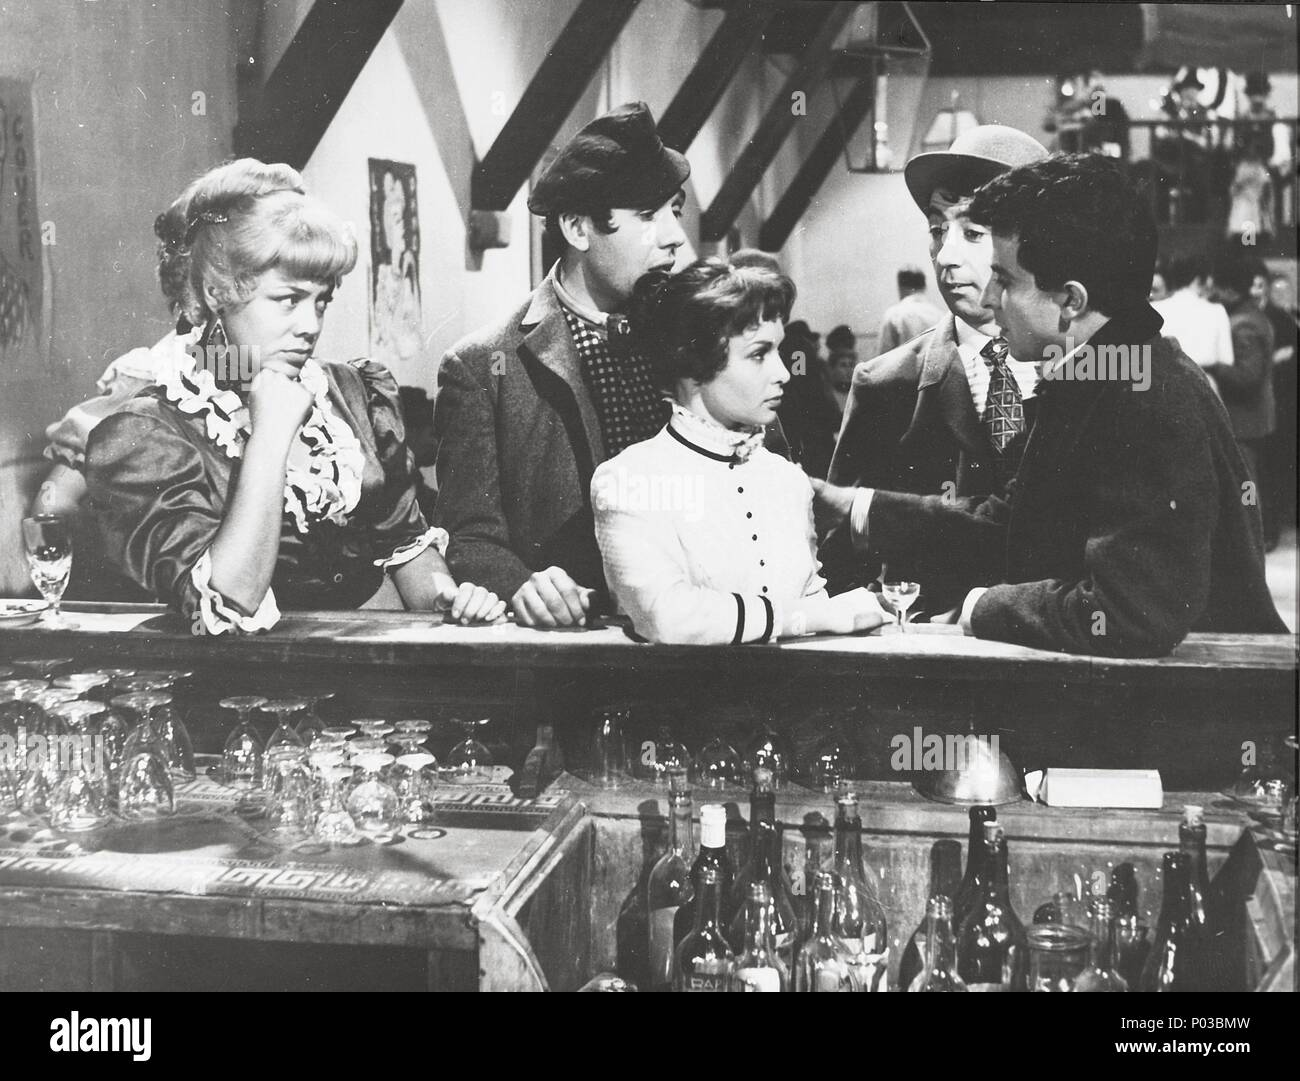 English Title: FRENCH CANCAN. Film Director: JEAN RENOIR. Year: 1954.  Stars: FRANCOISE ARNOUL. Credit: FRANCO LONDON FILMS / Album